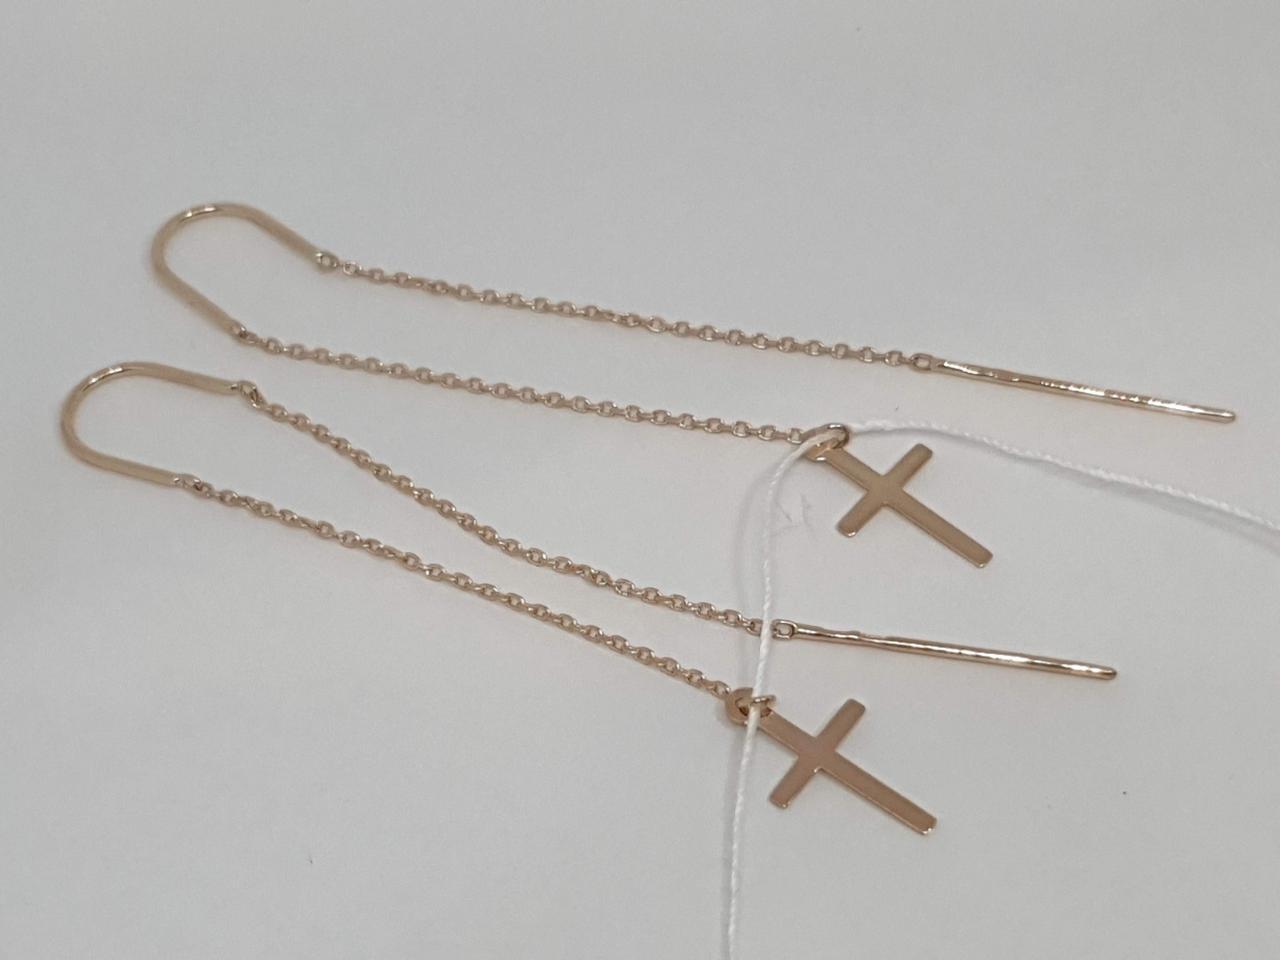 Золотые серьги-протяжки. Артикул 580111